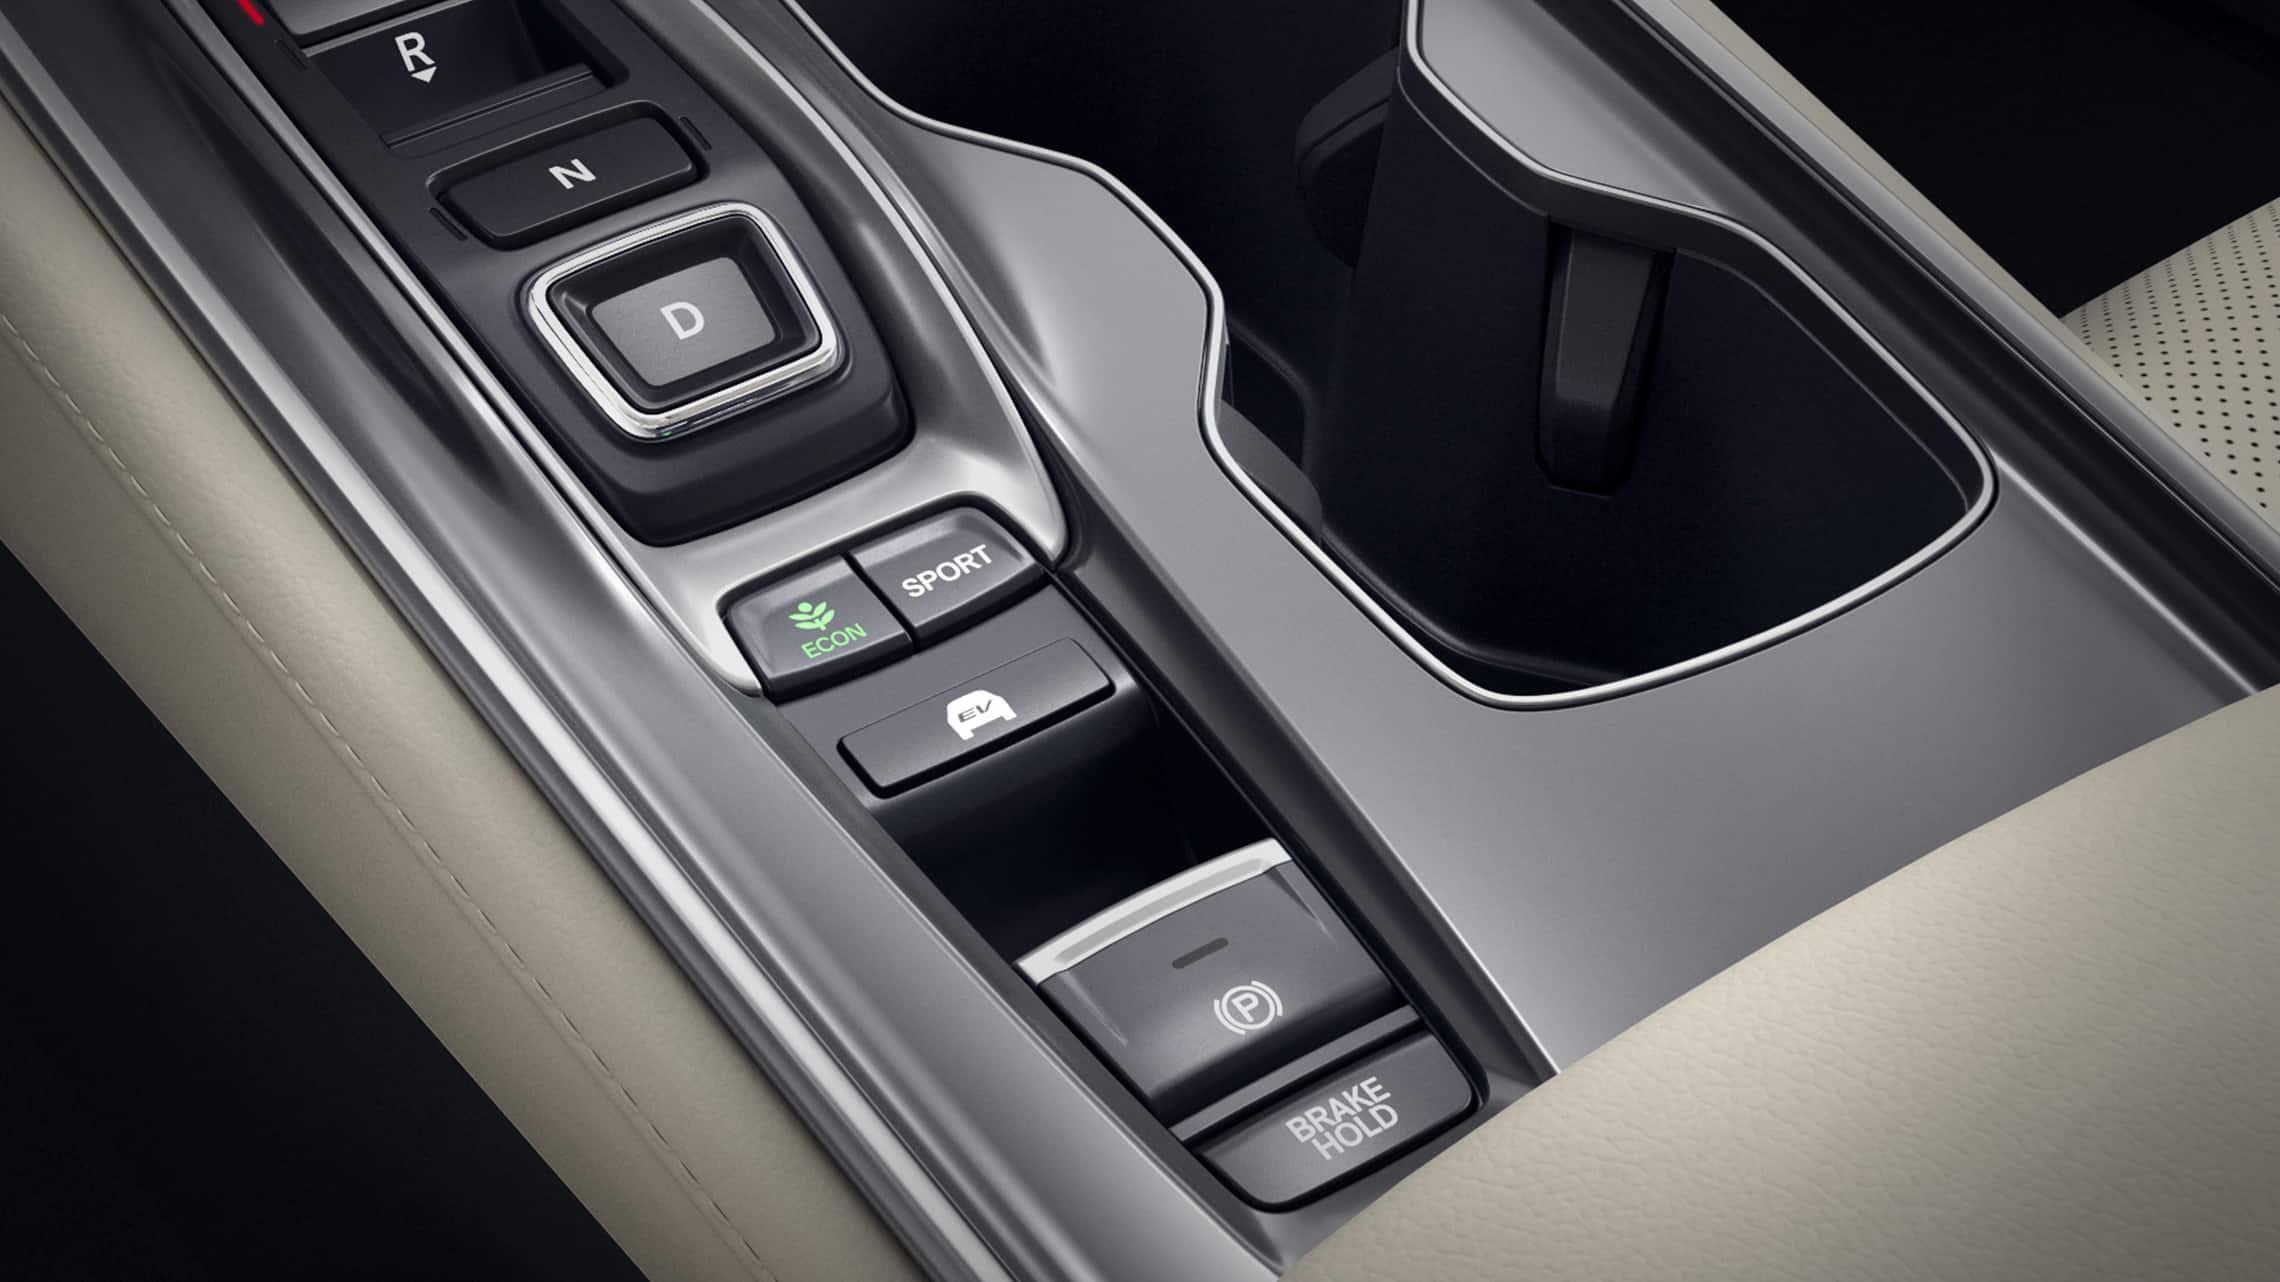 Detalle del selector de modo EV del HondaAccord HybridTouring2020.